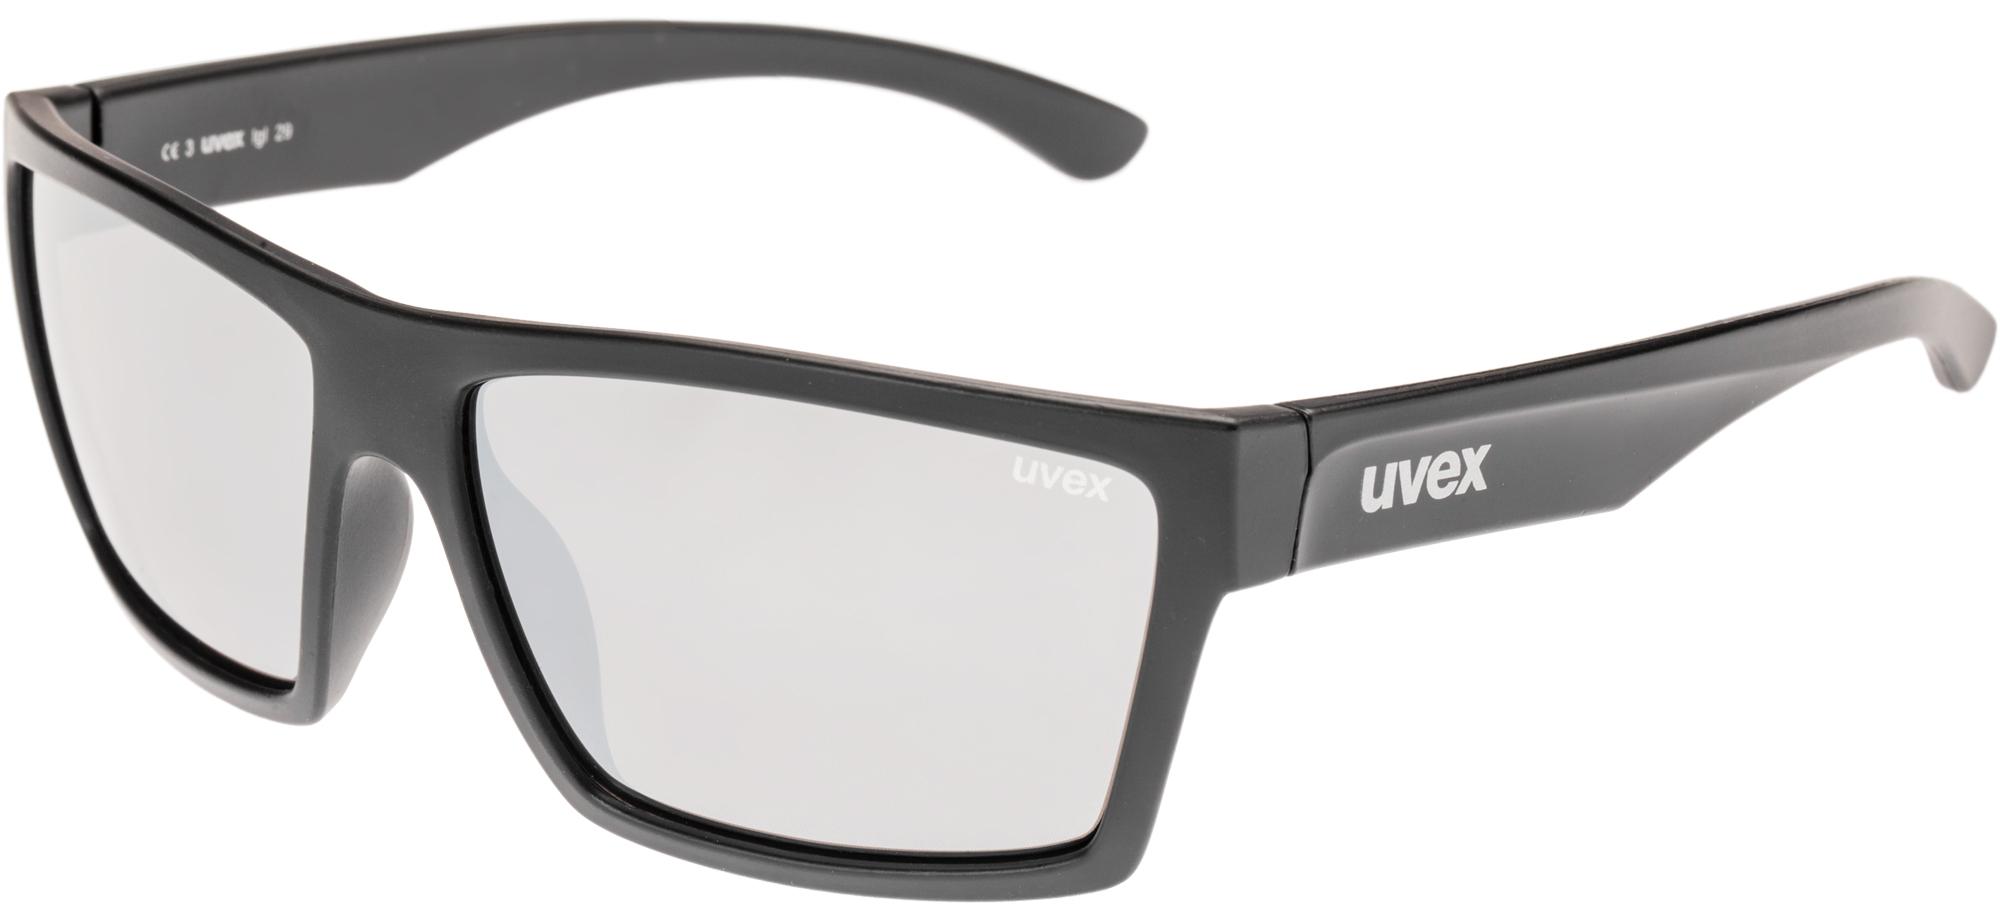 Uvex Солнцезащитные очки